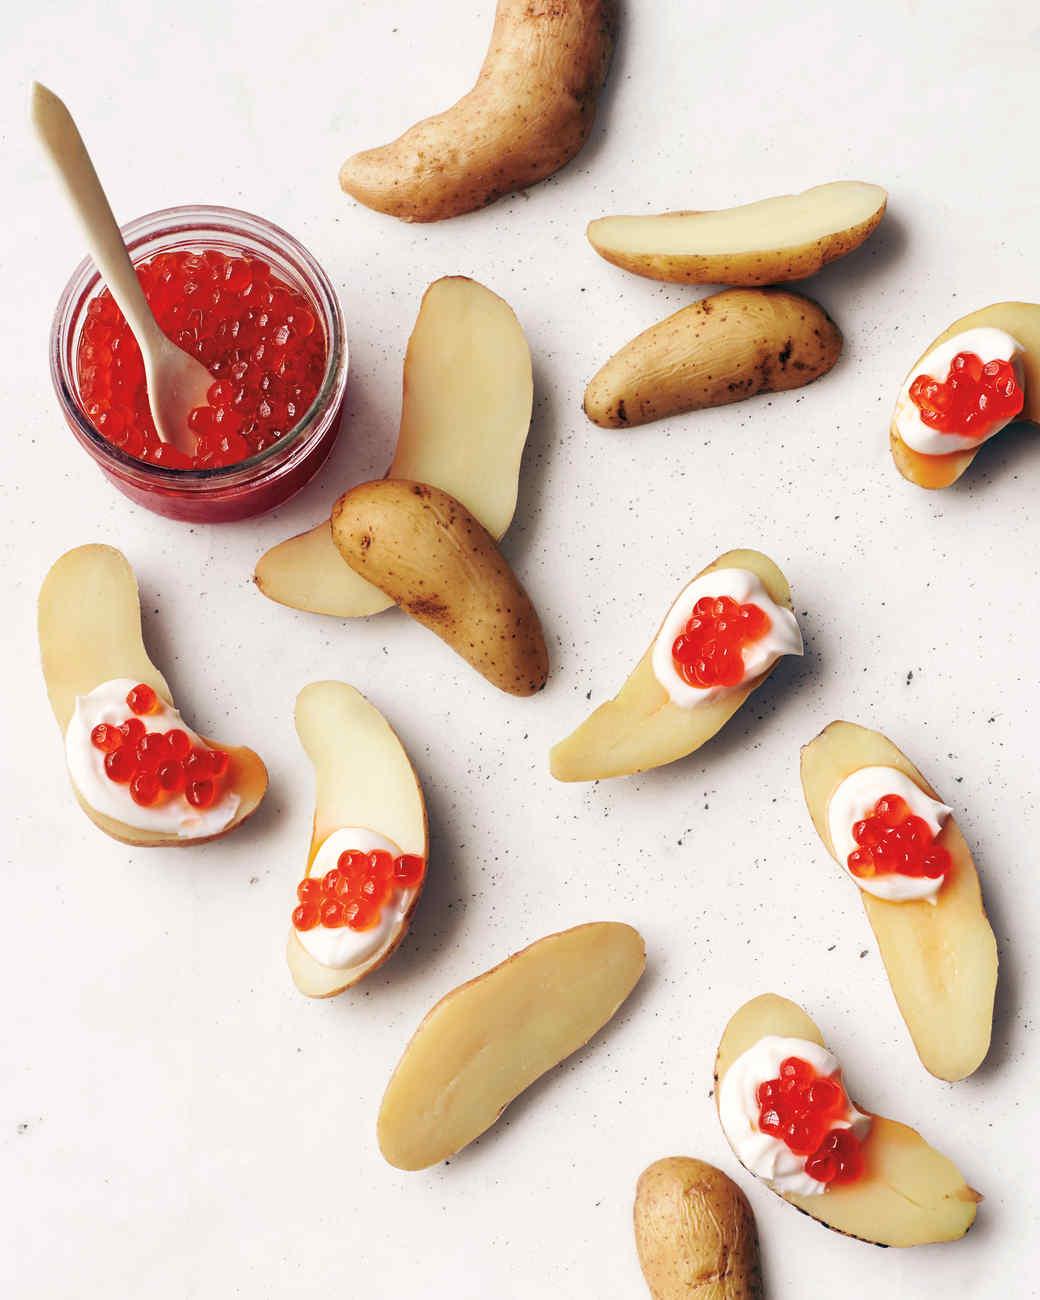 perfect-bites-potatoes-roe-4000-d111358.jpg